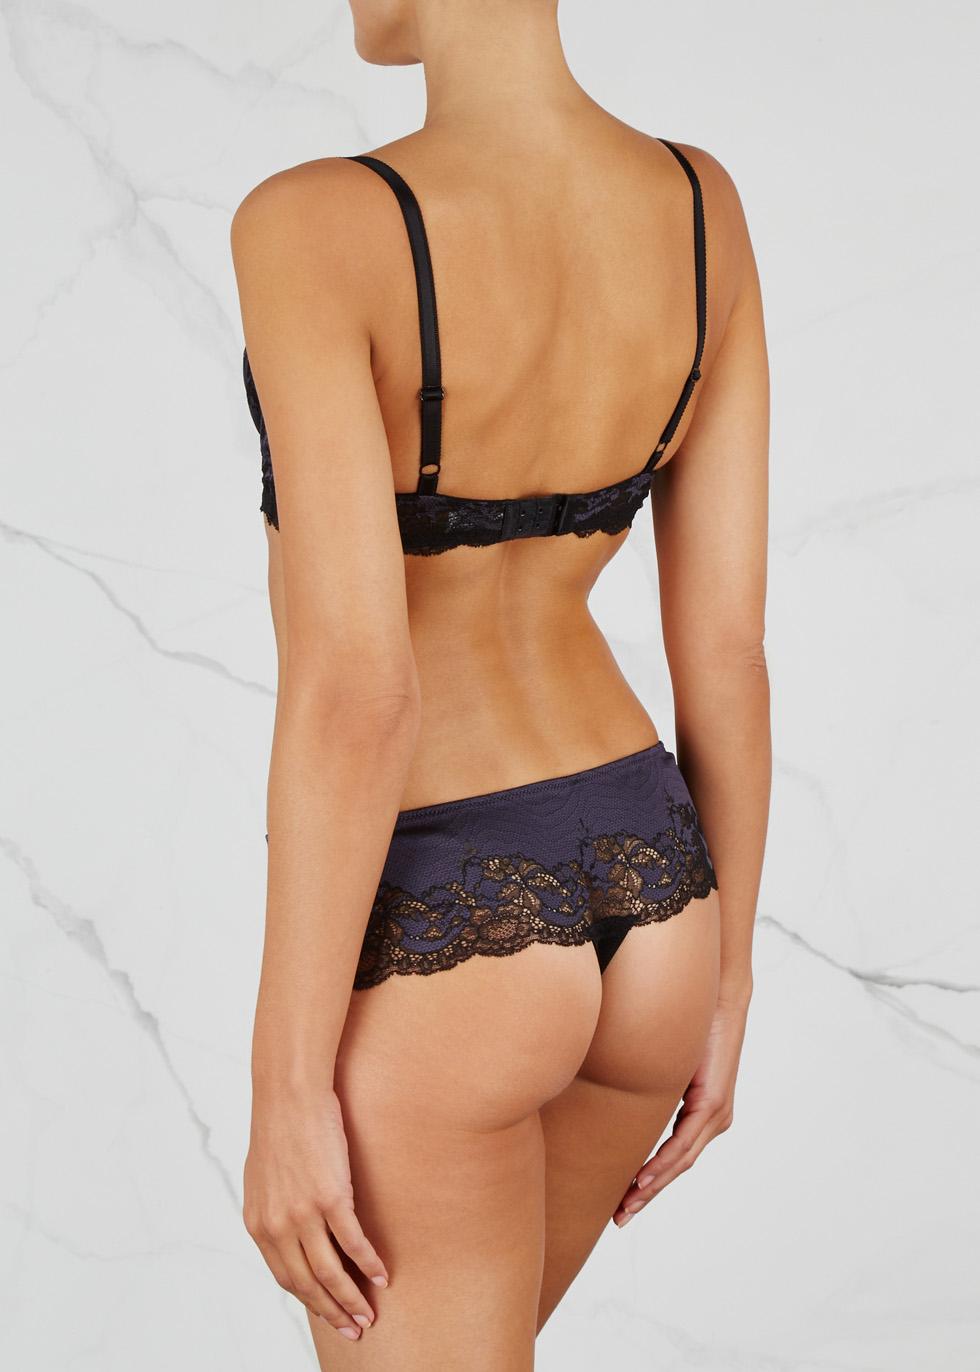 Lace Affair lace bra - Wacoal